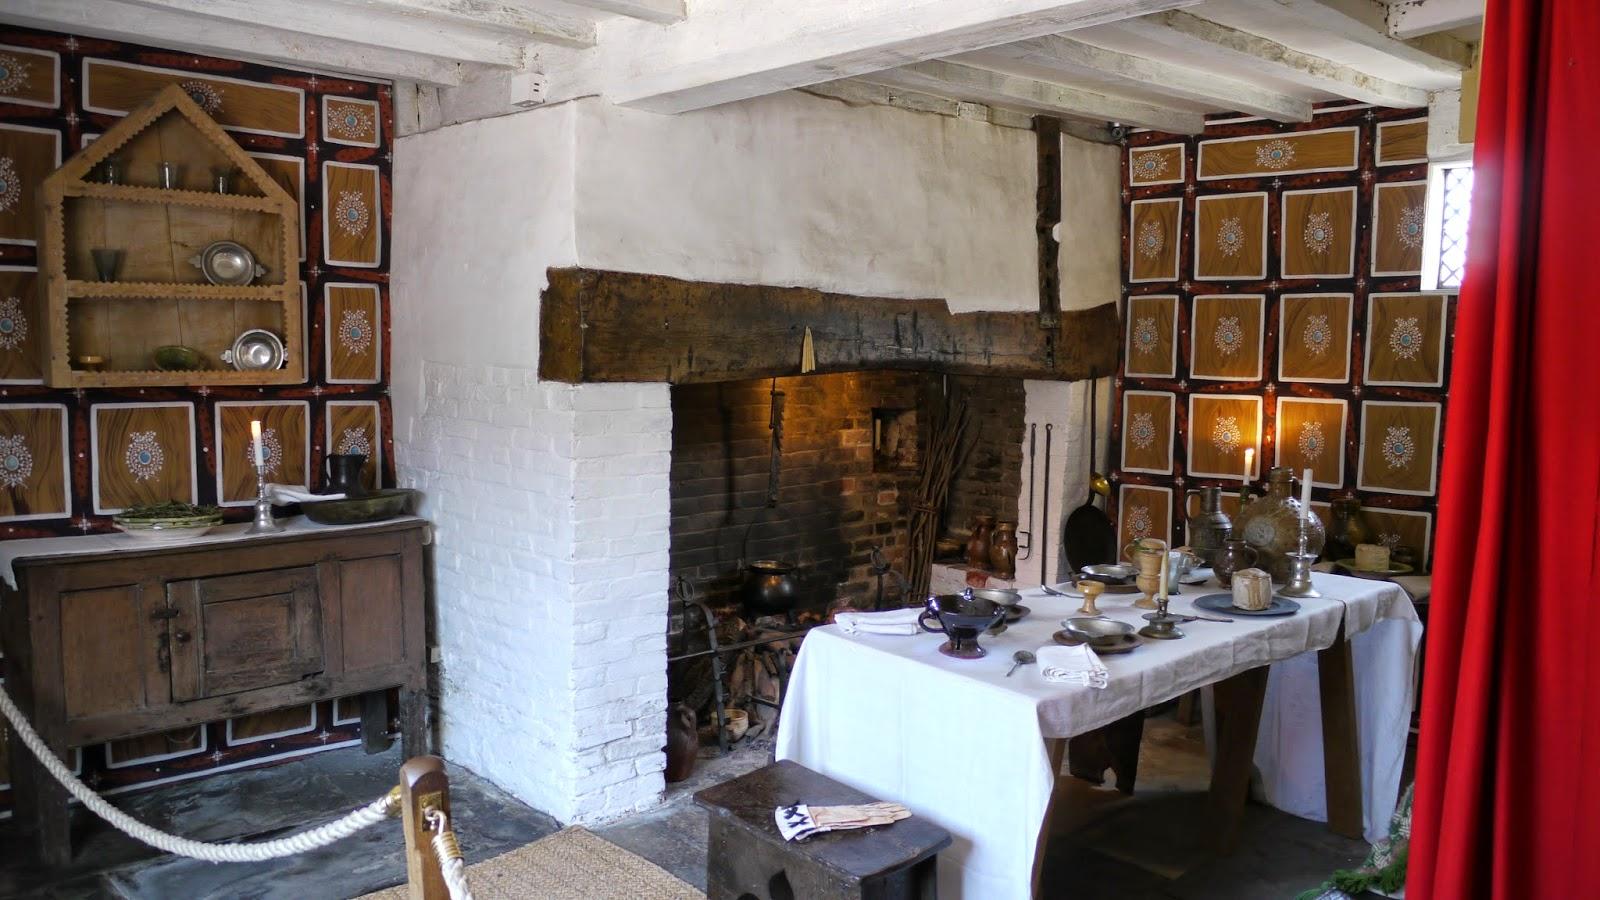 shakespeare's home, interior, stratford upon avon